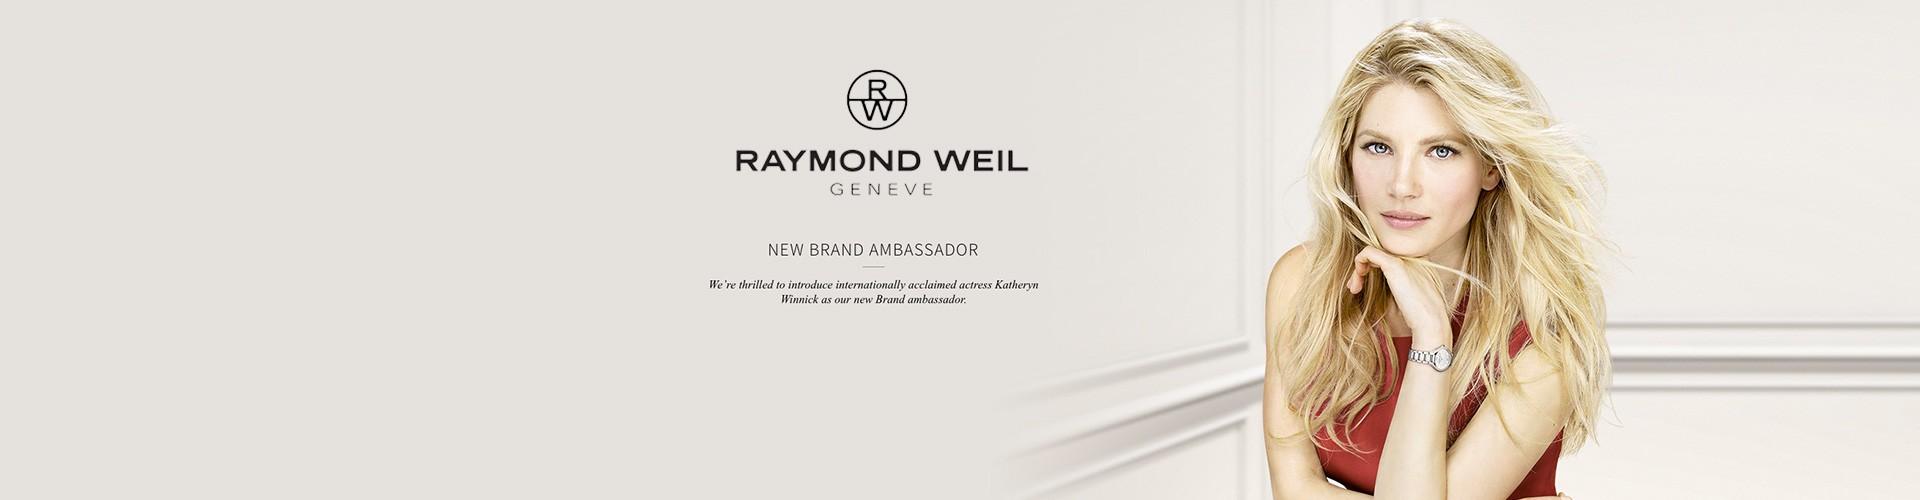 raymond-weil-ambassador